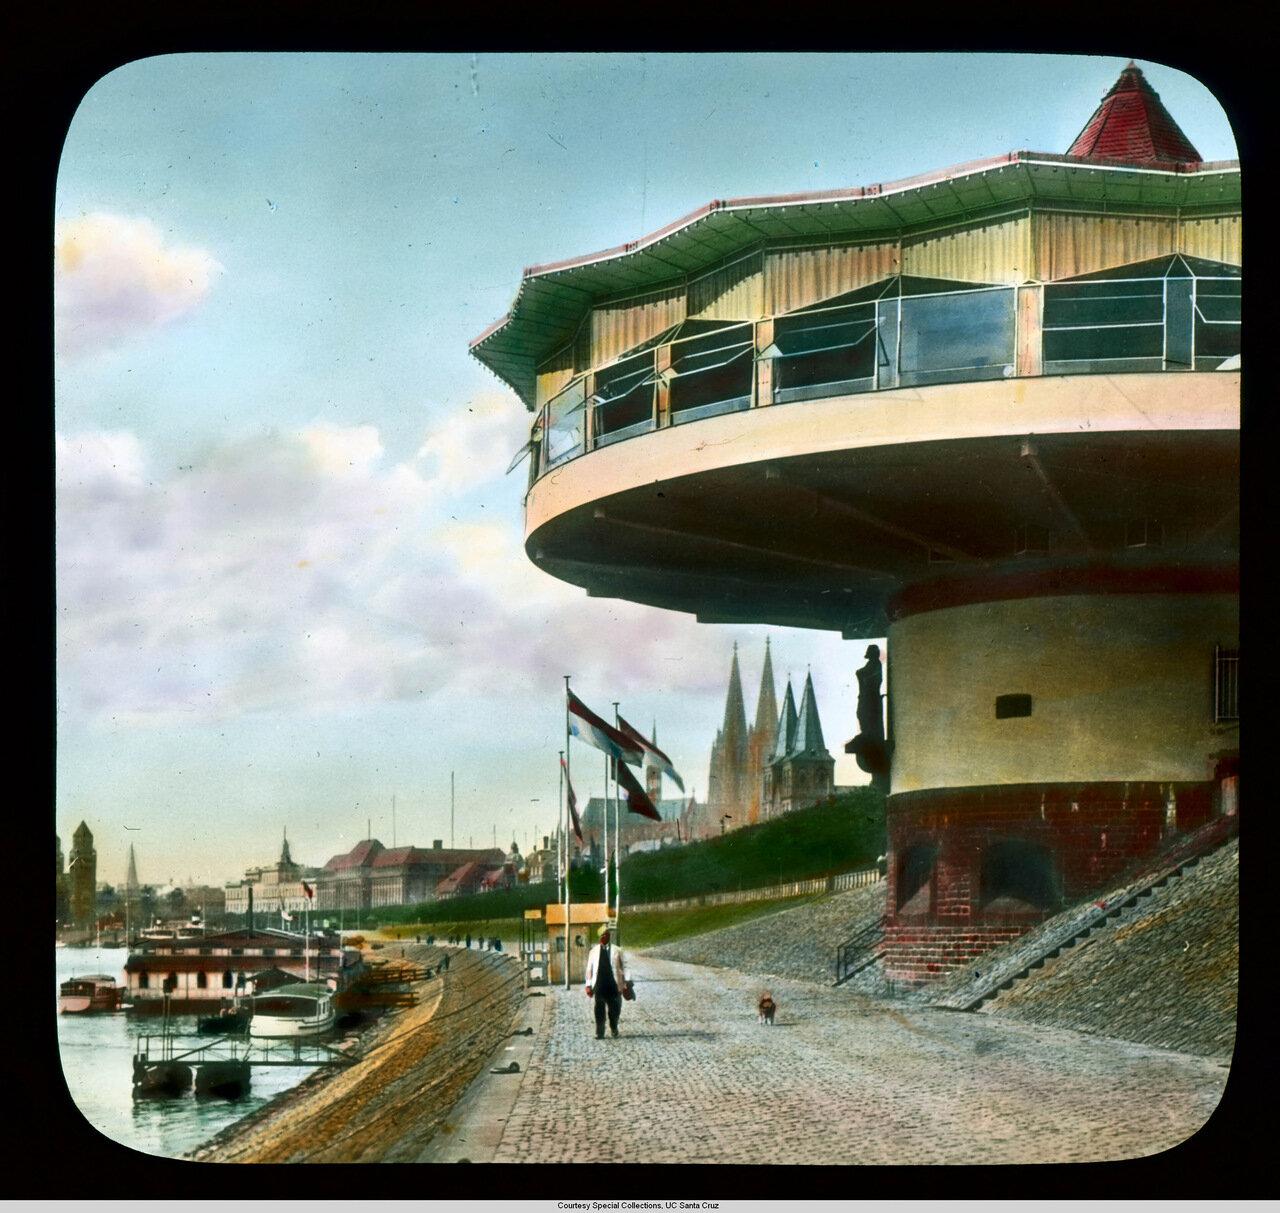 Кельн. Ресторан Бастай на берегу Рейна